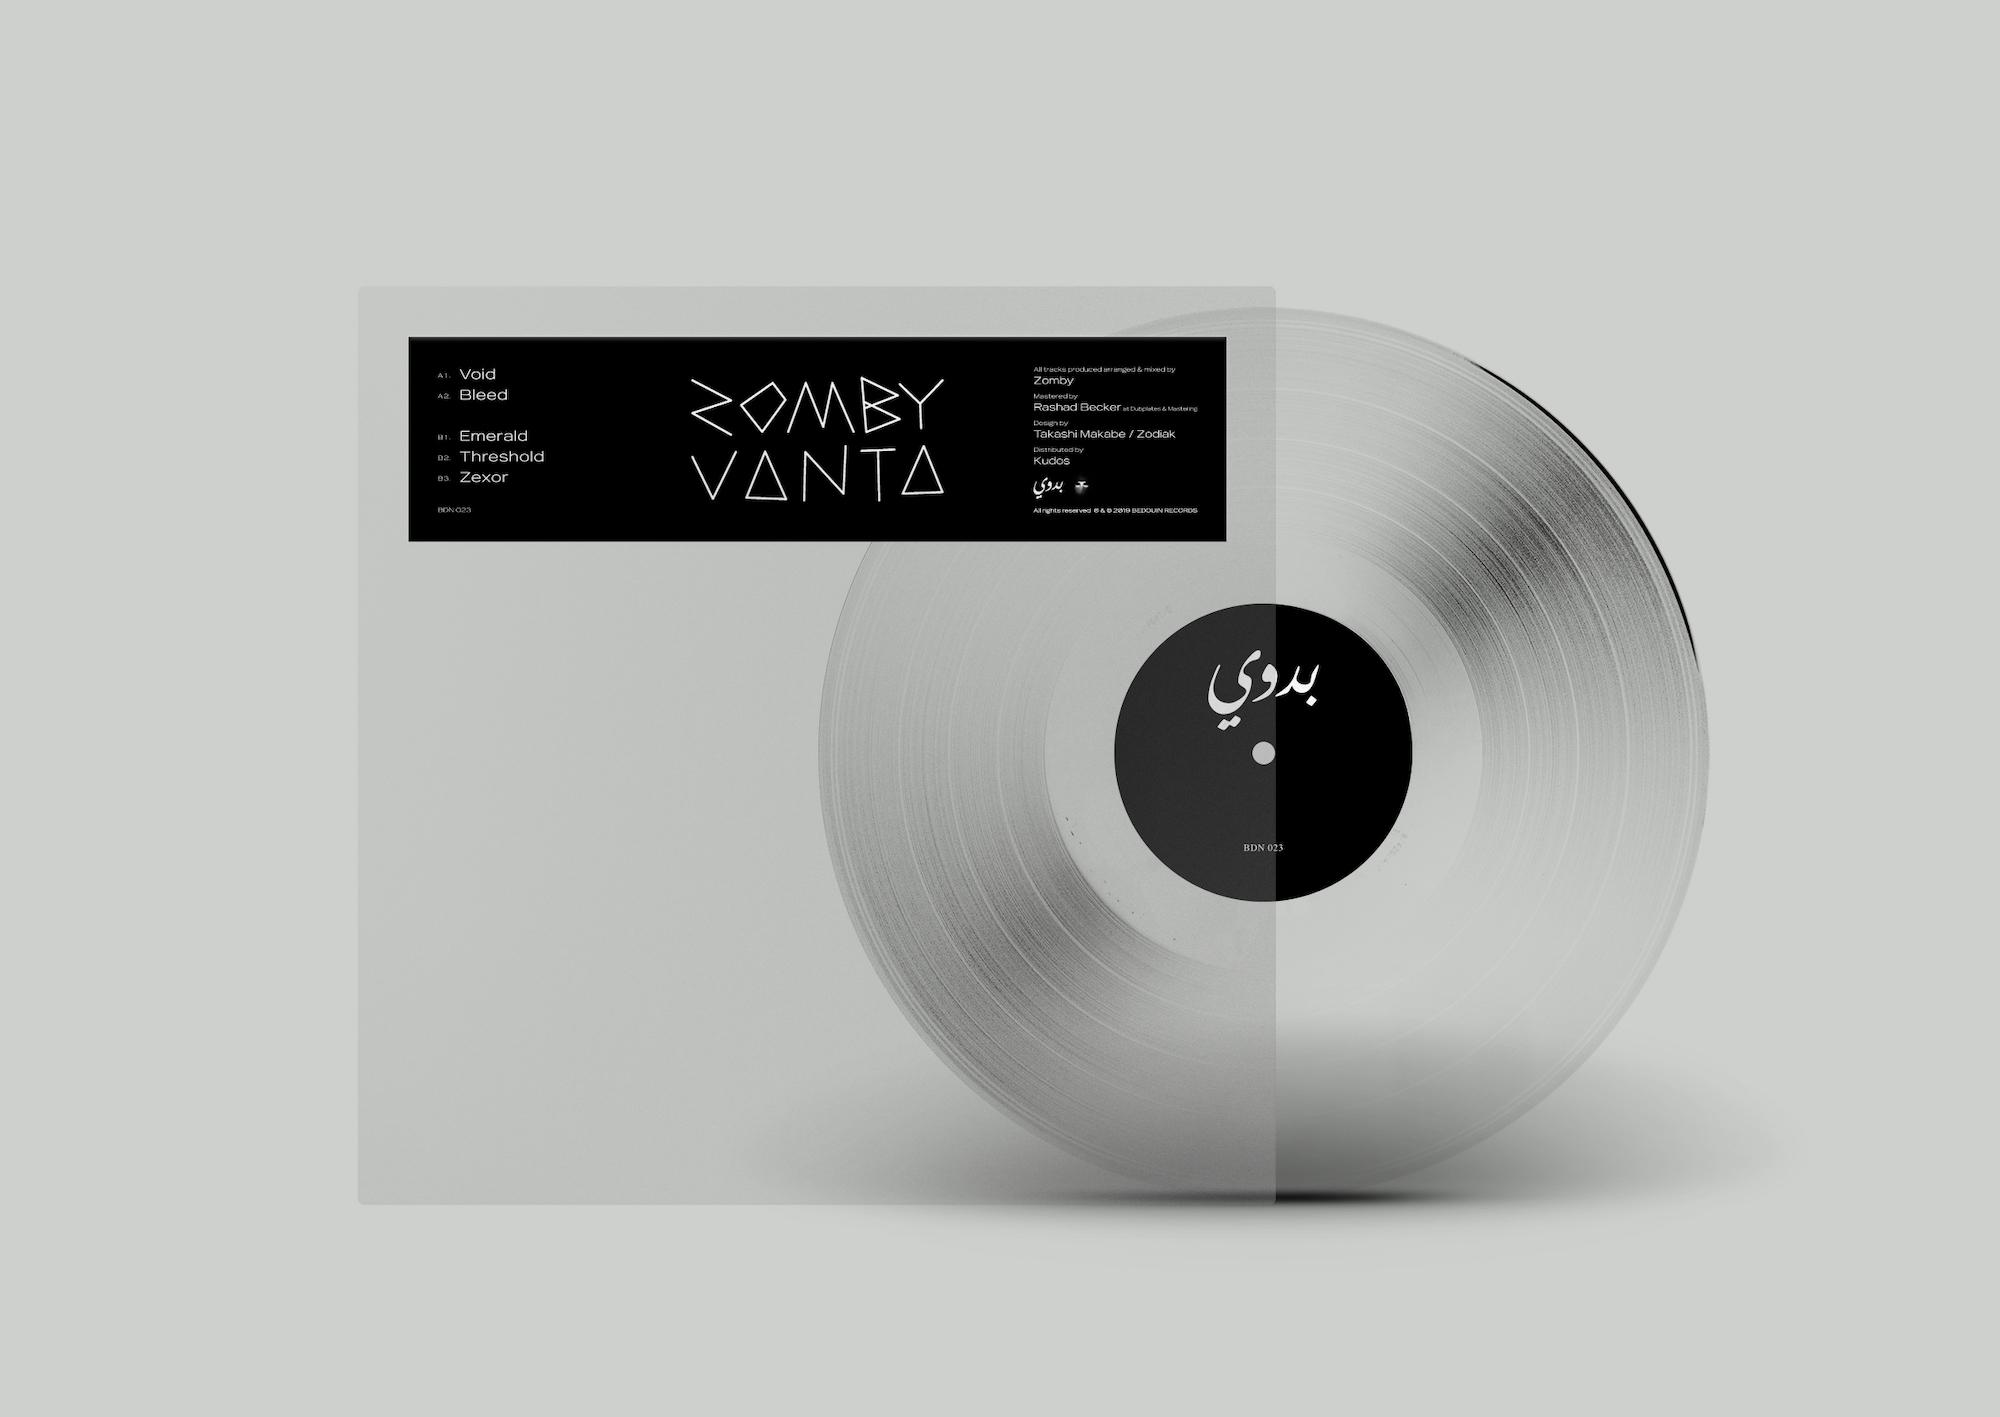 Zomby | Vanta EP vinyl